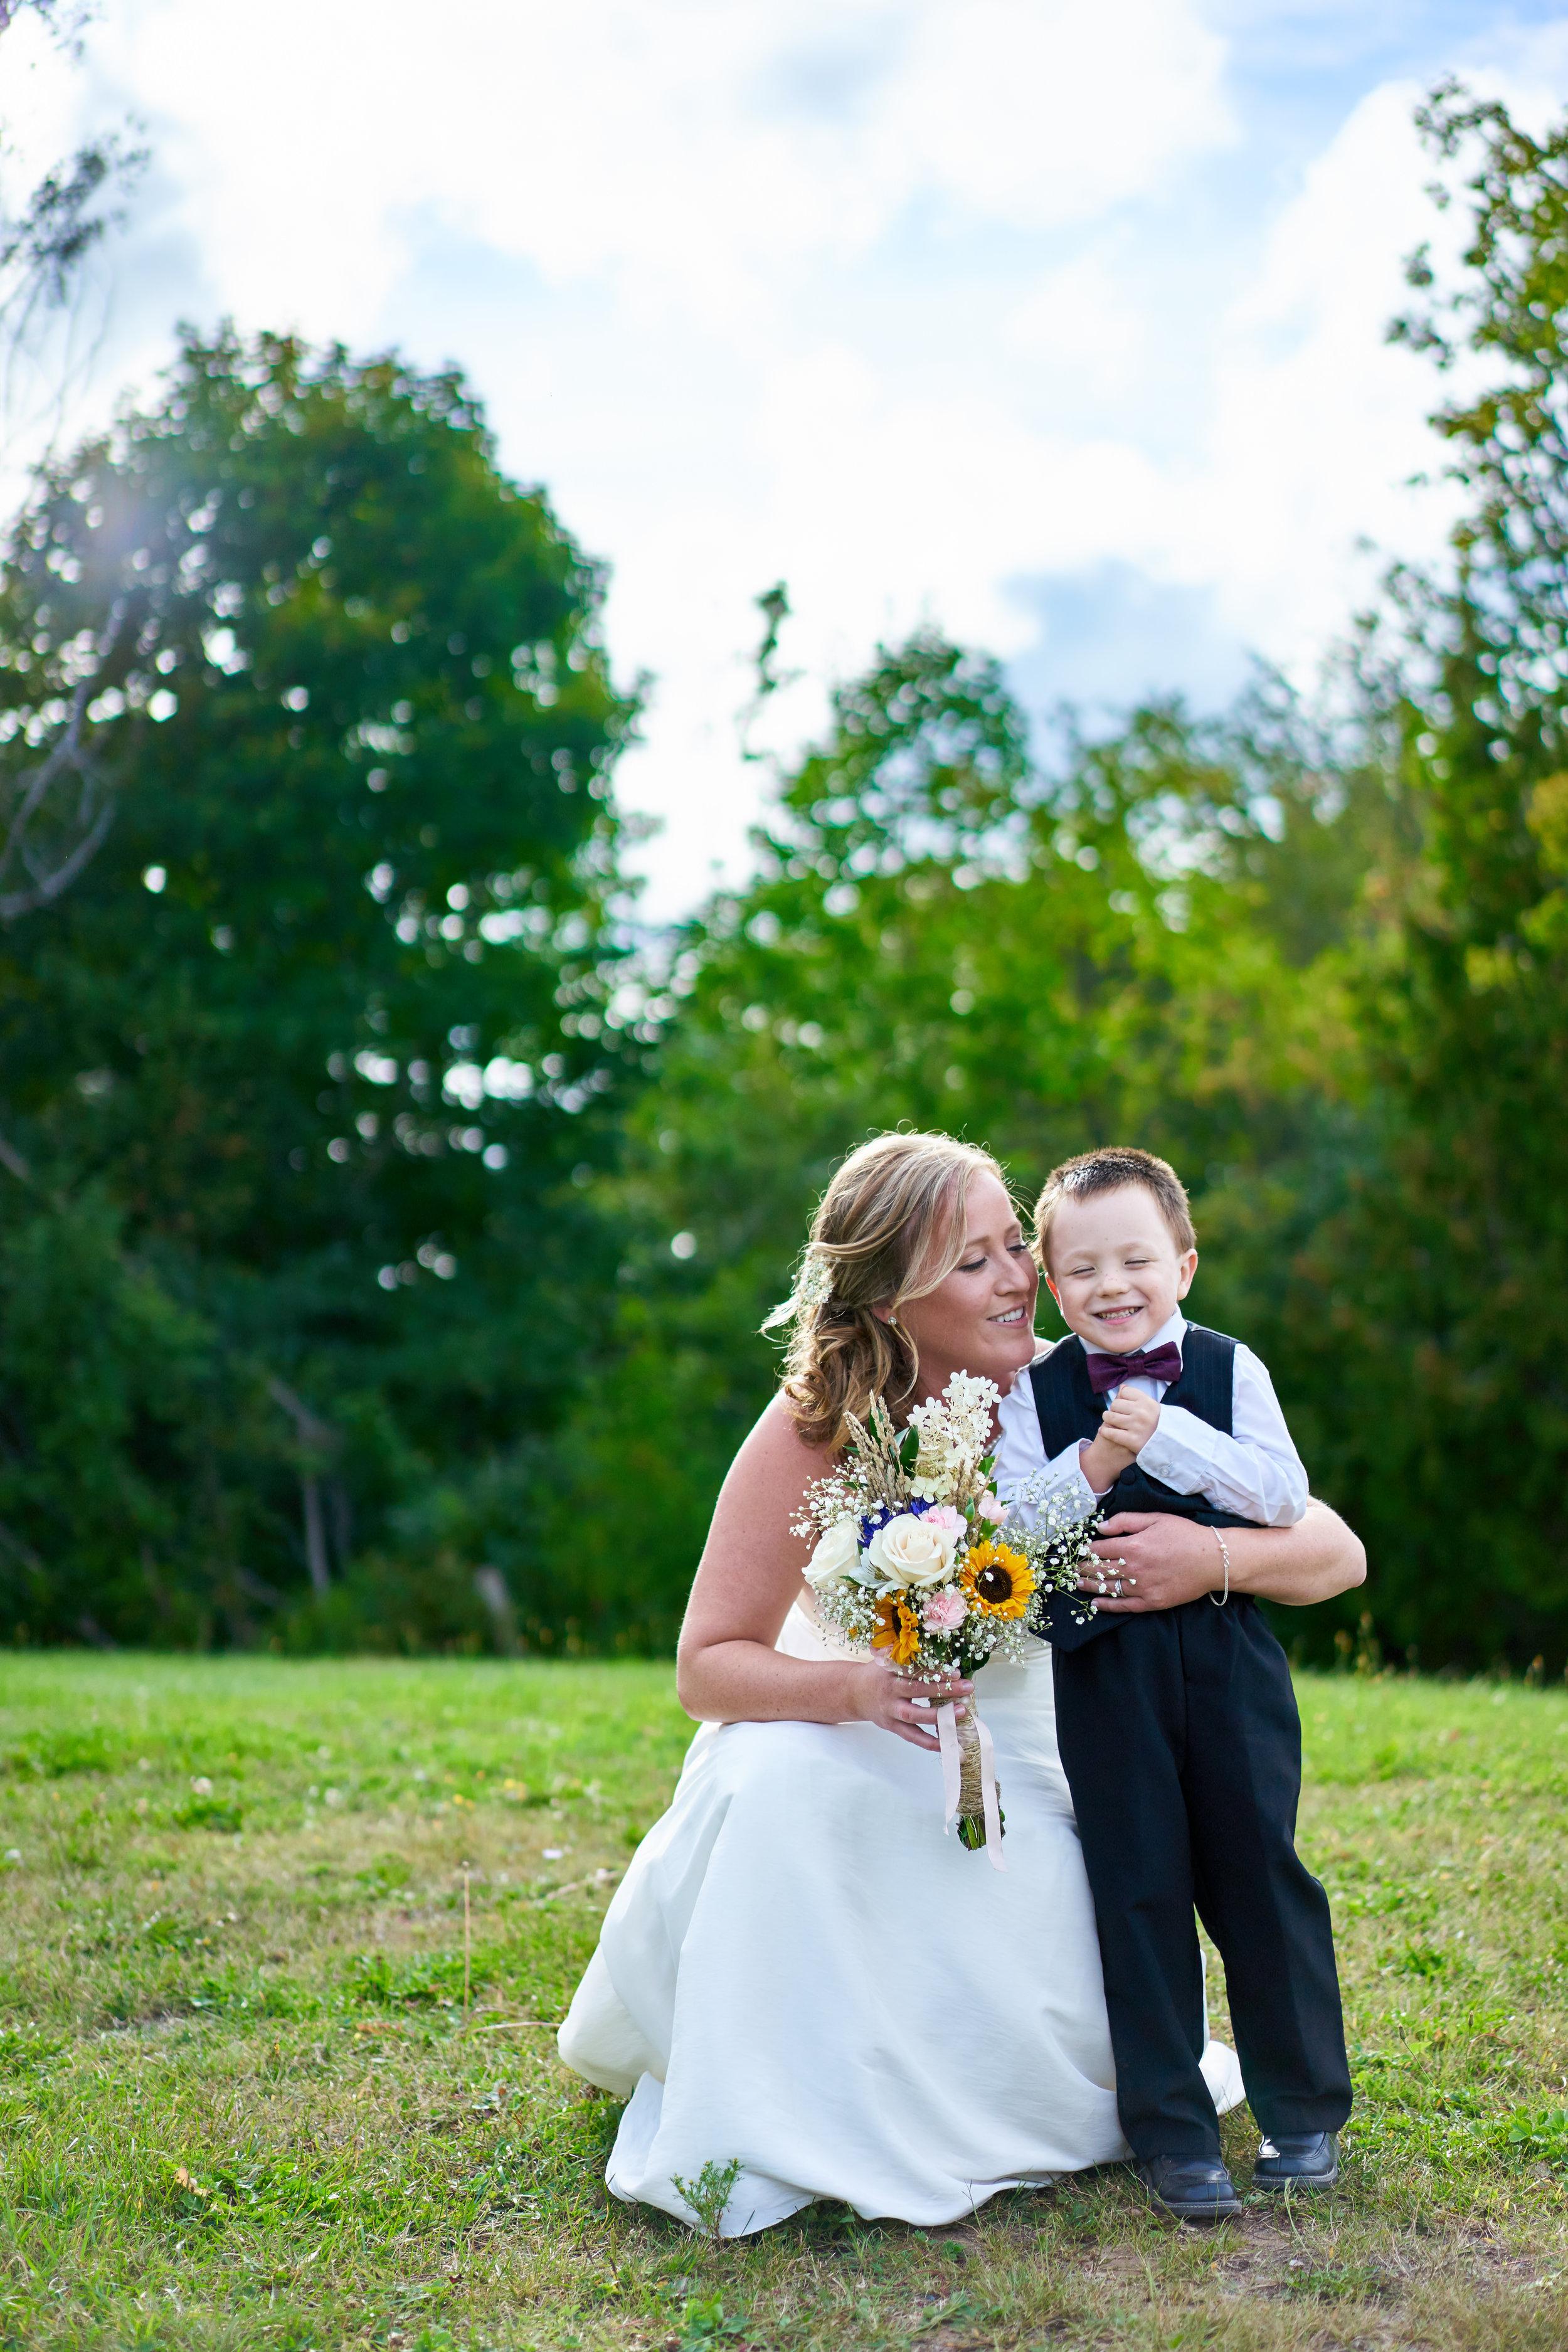 Meghan & Daniel's Wedding 352.jpg